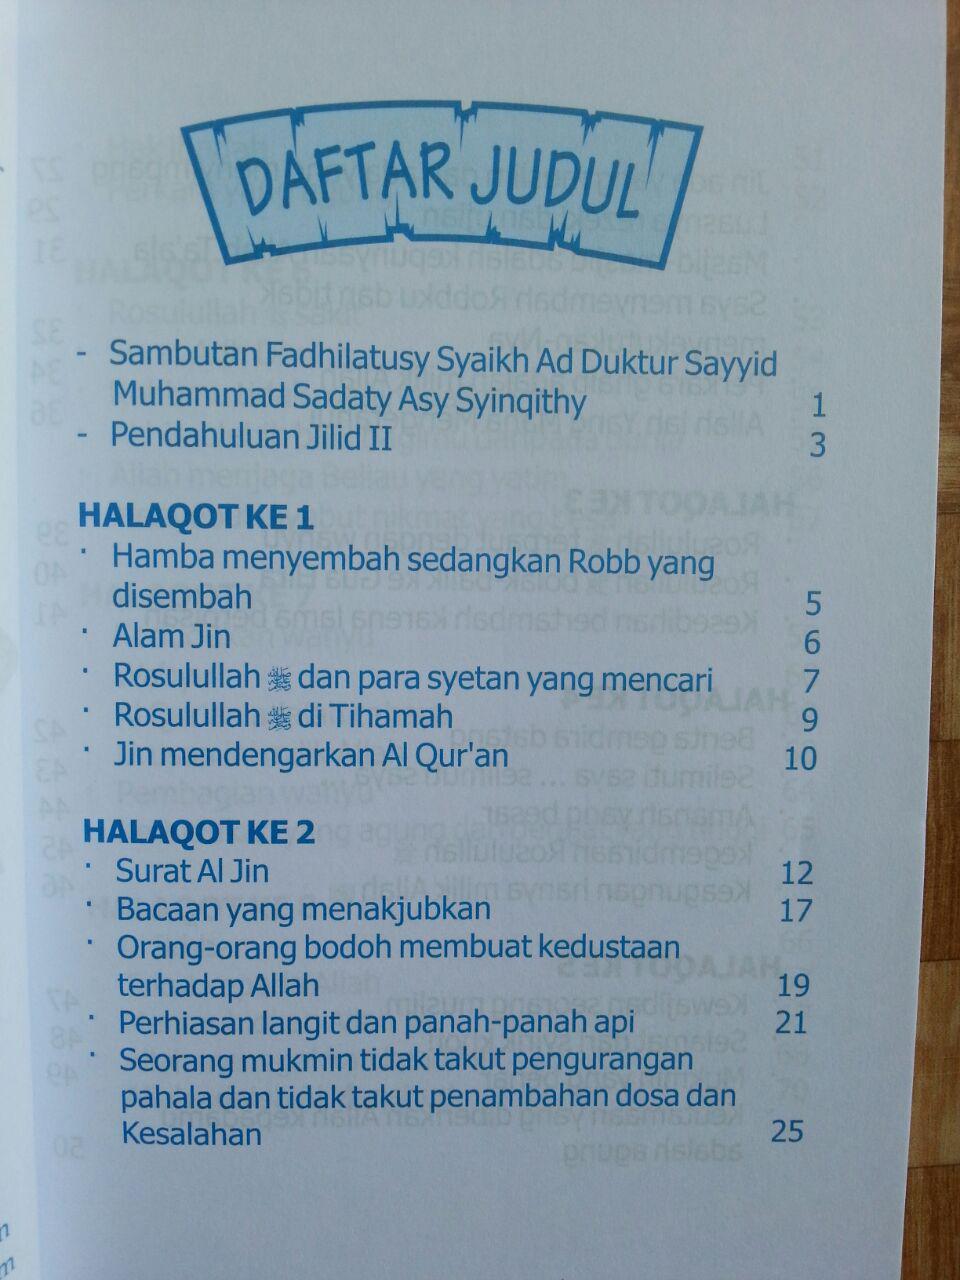 Buku Siroh Nabawiyah Versi Anak-Anak Jilid 2 isi 2